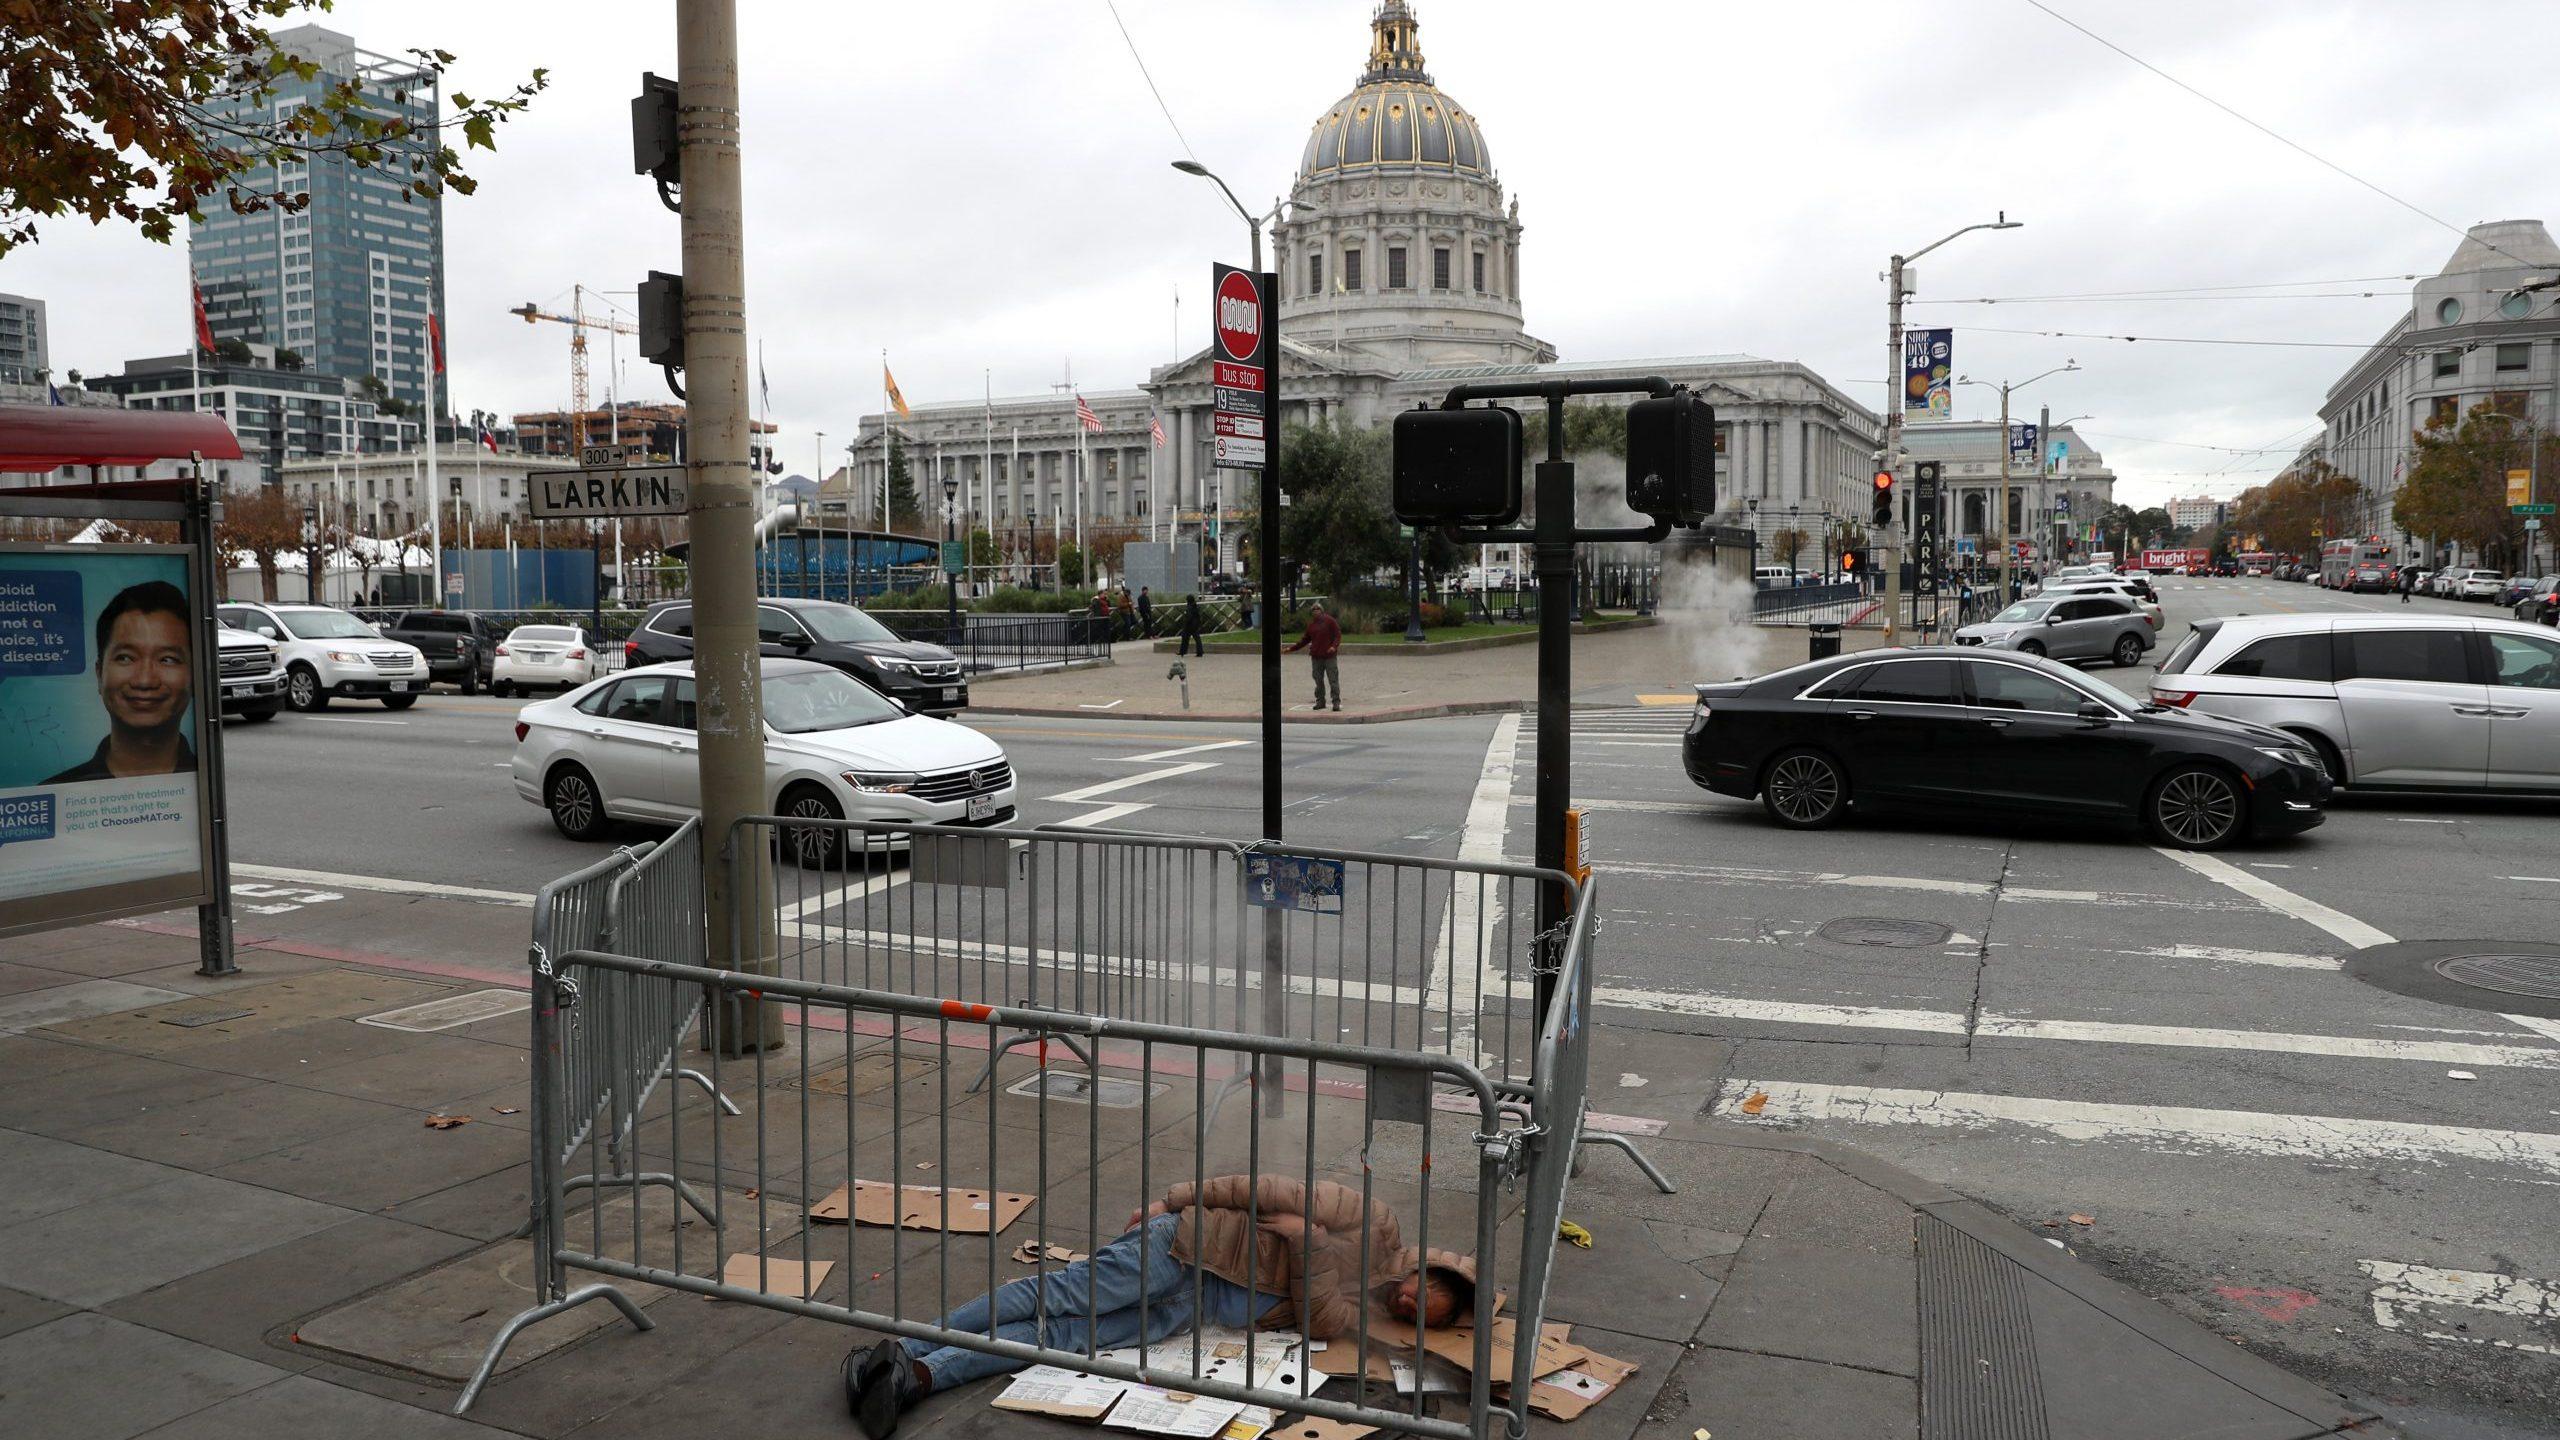 A homeless man sleeps on the sidewalk near San Francisco City Hall on Dec. 5, 2019, in San Francisco, California. (Credit: Justin Sullivan/Getty Images)